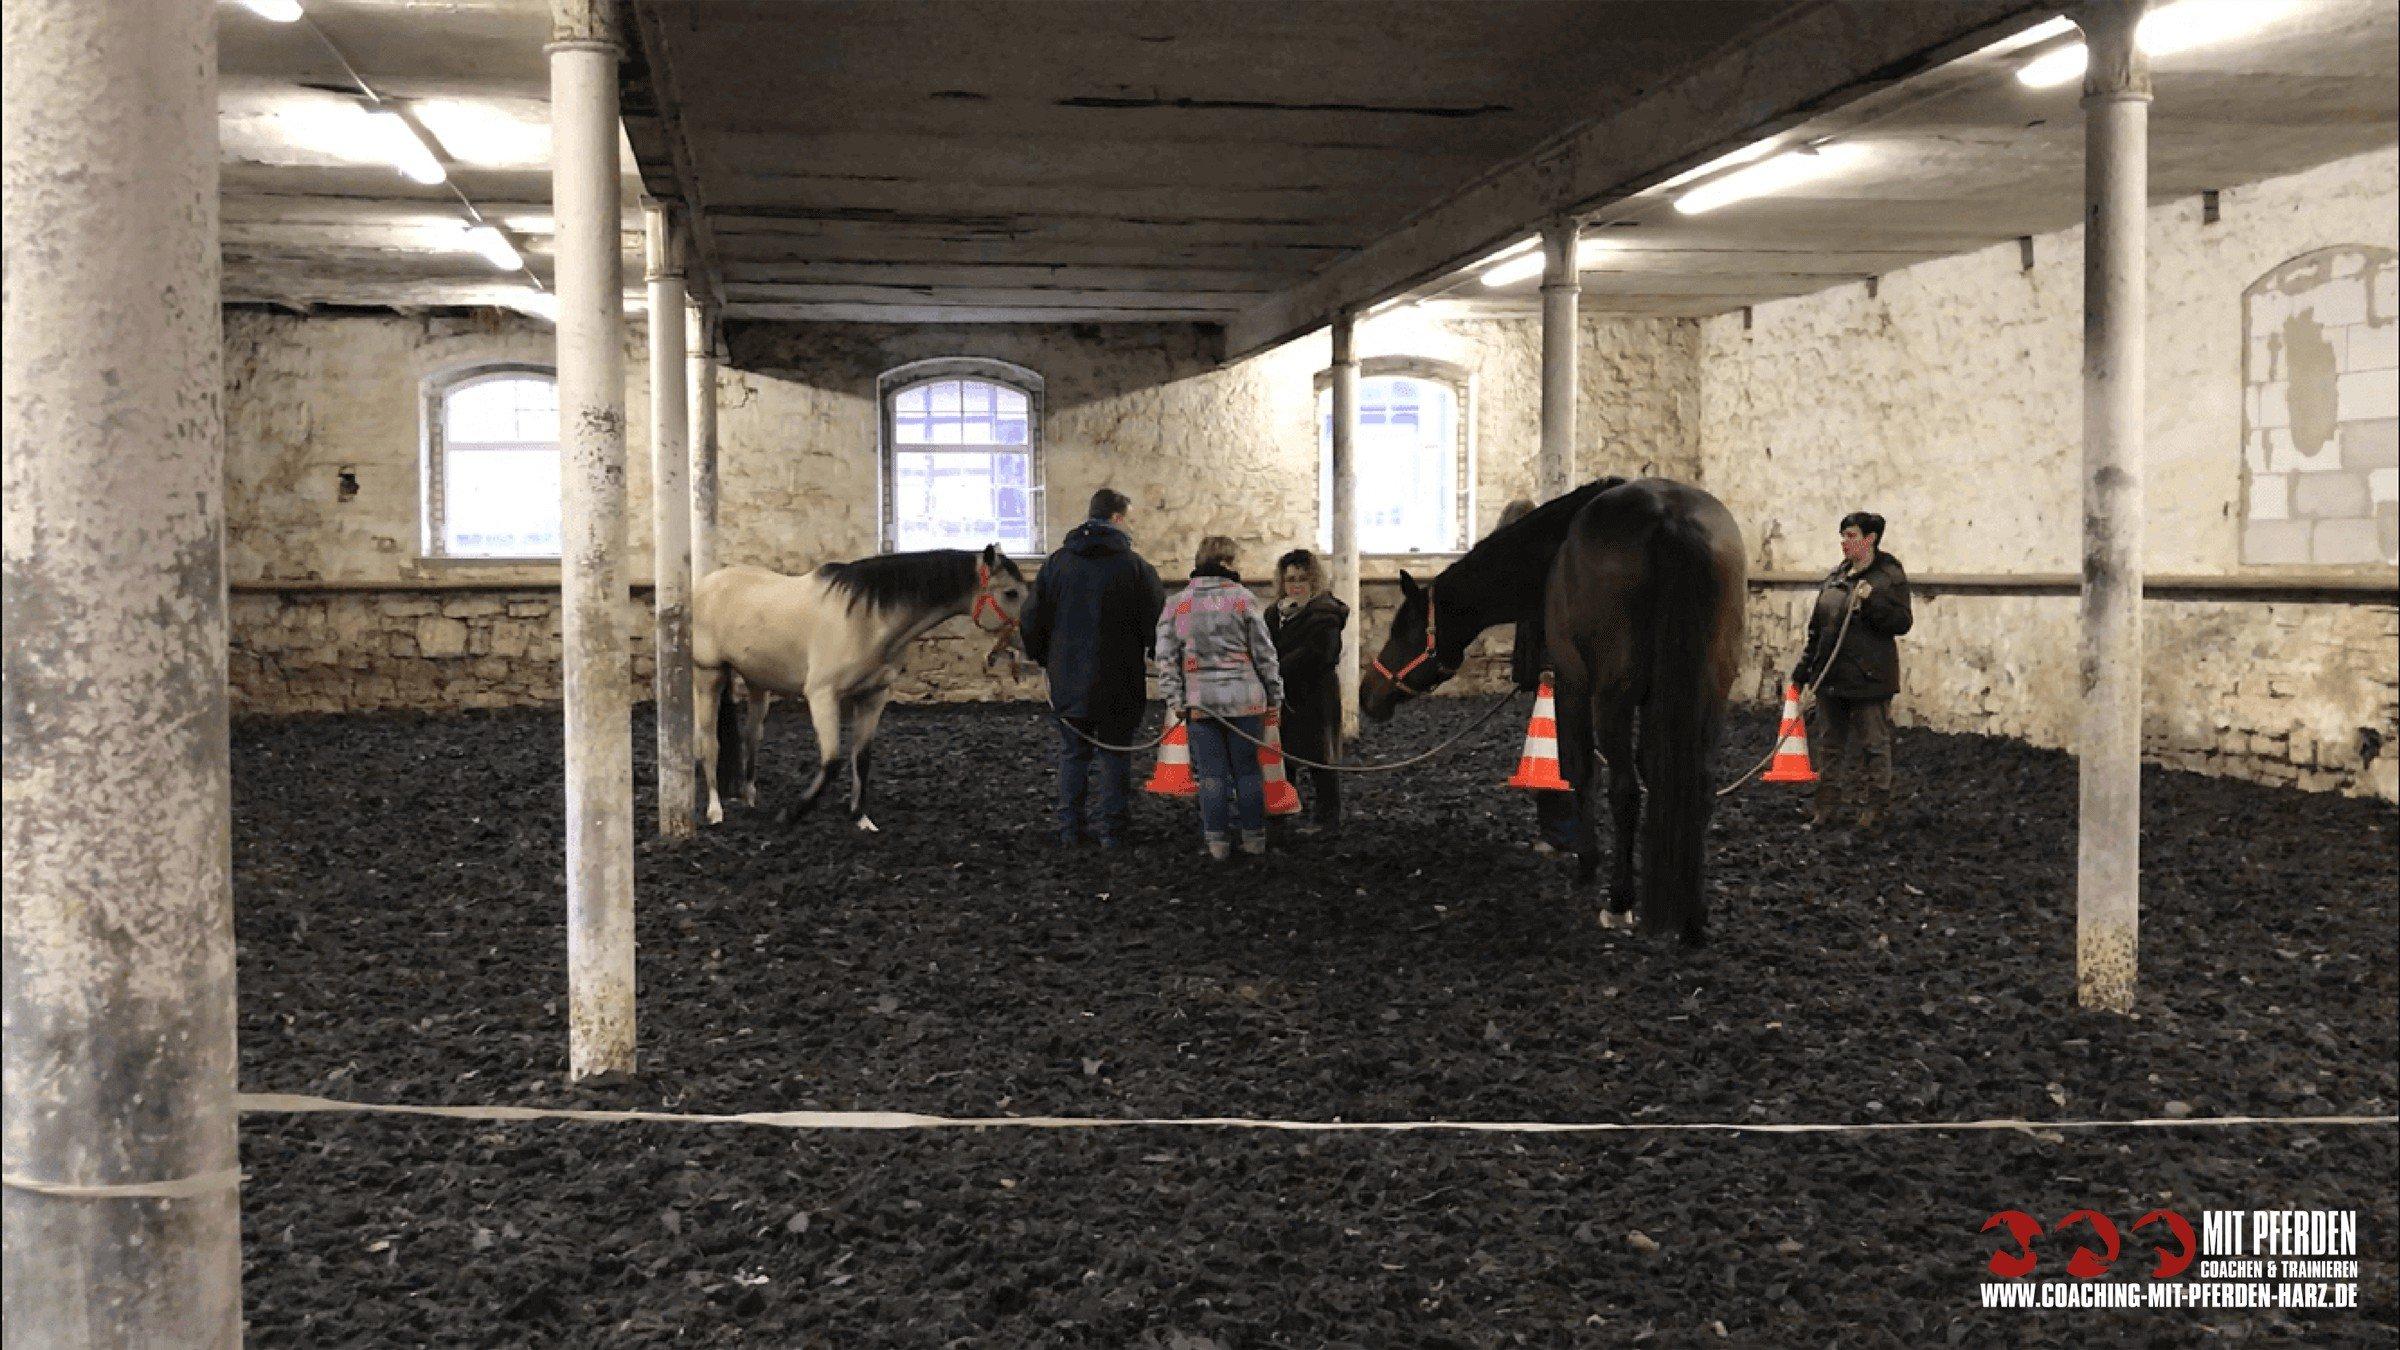 Gruppencoaching - Angebote | Coaching mit Pferden Harz